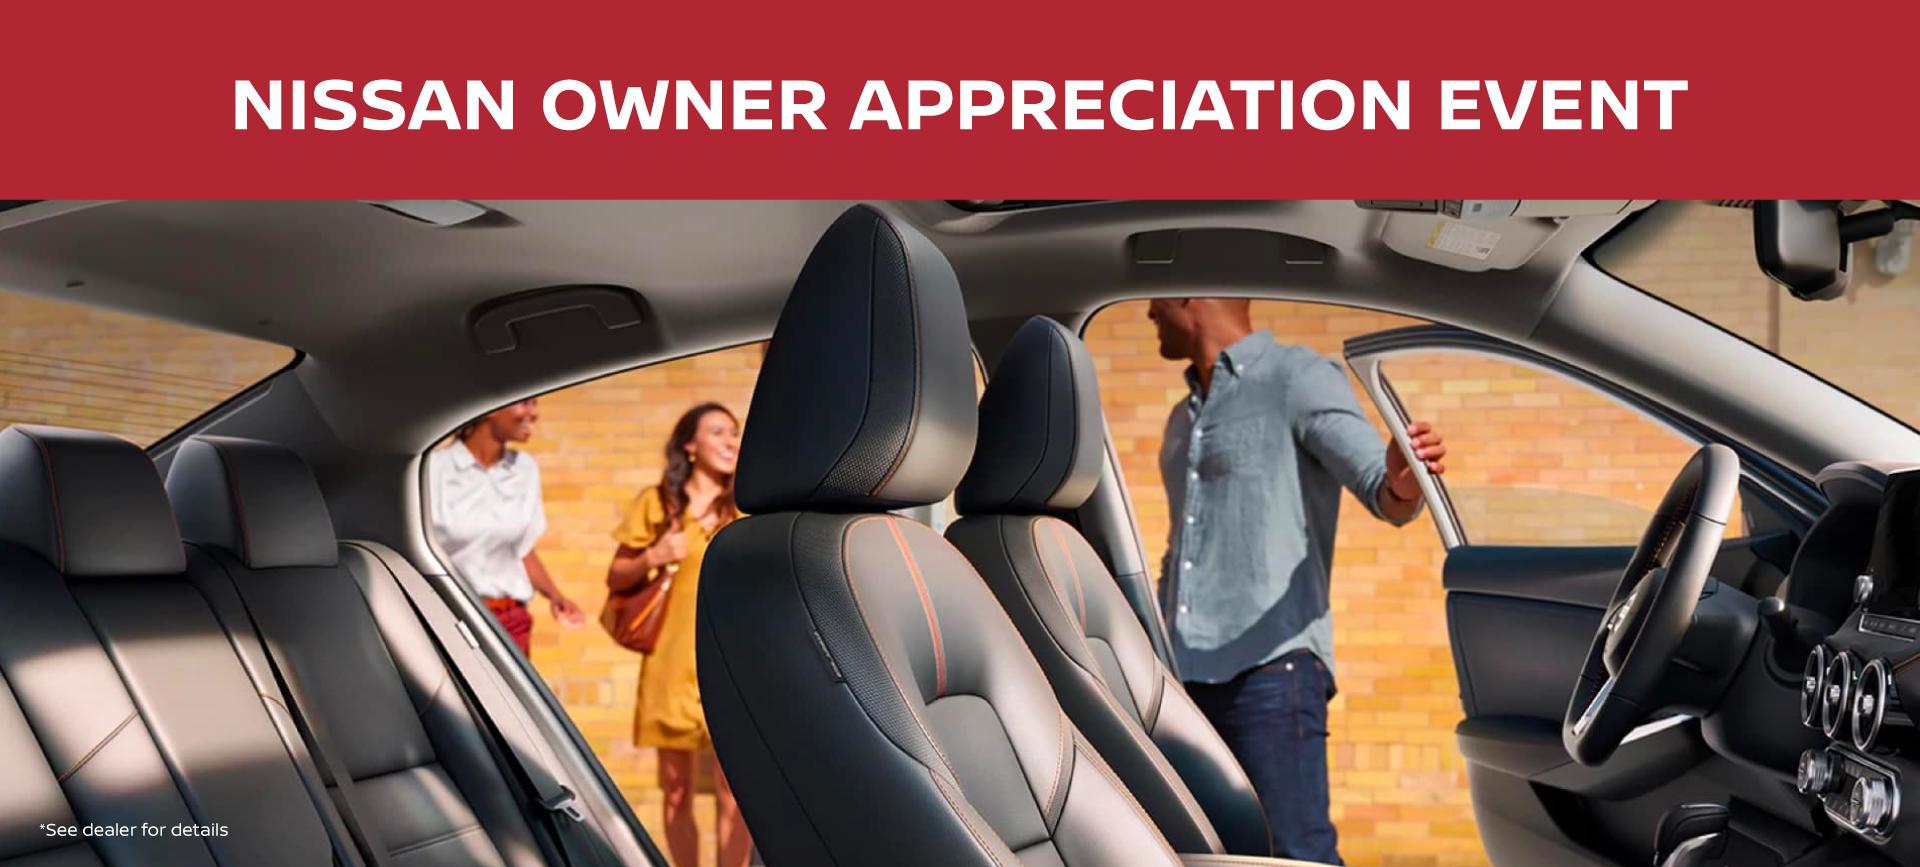 Nissan-Bellevue-OEM-1020_OwnerAppreciation